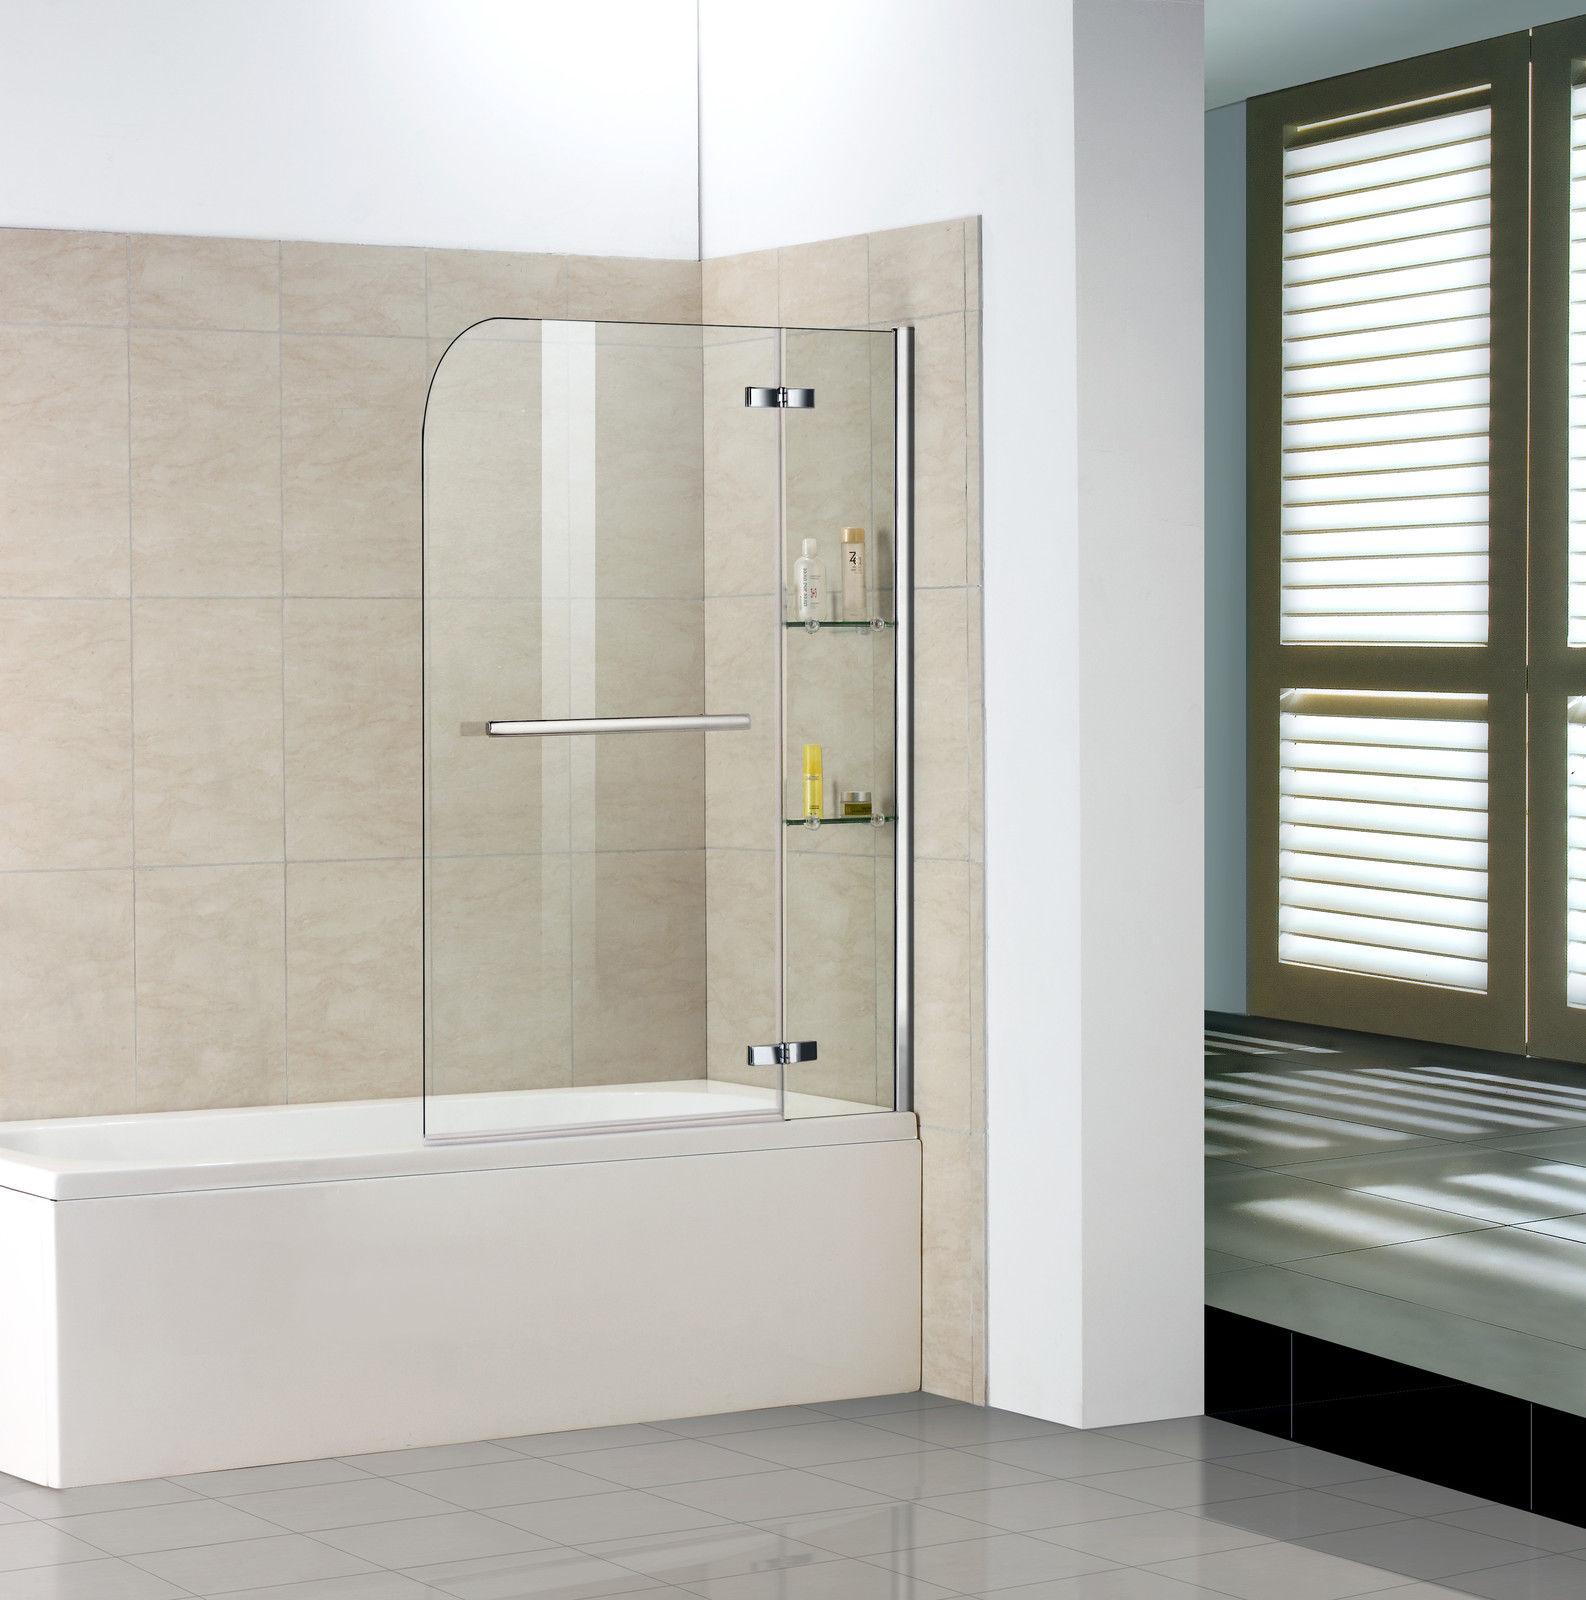 Badewanne 2 tlg. Faltwand Duschwand Drehen 90 Grad duschabtrennung ...